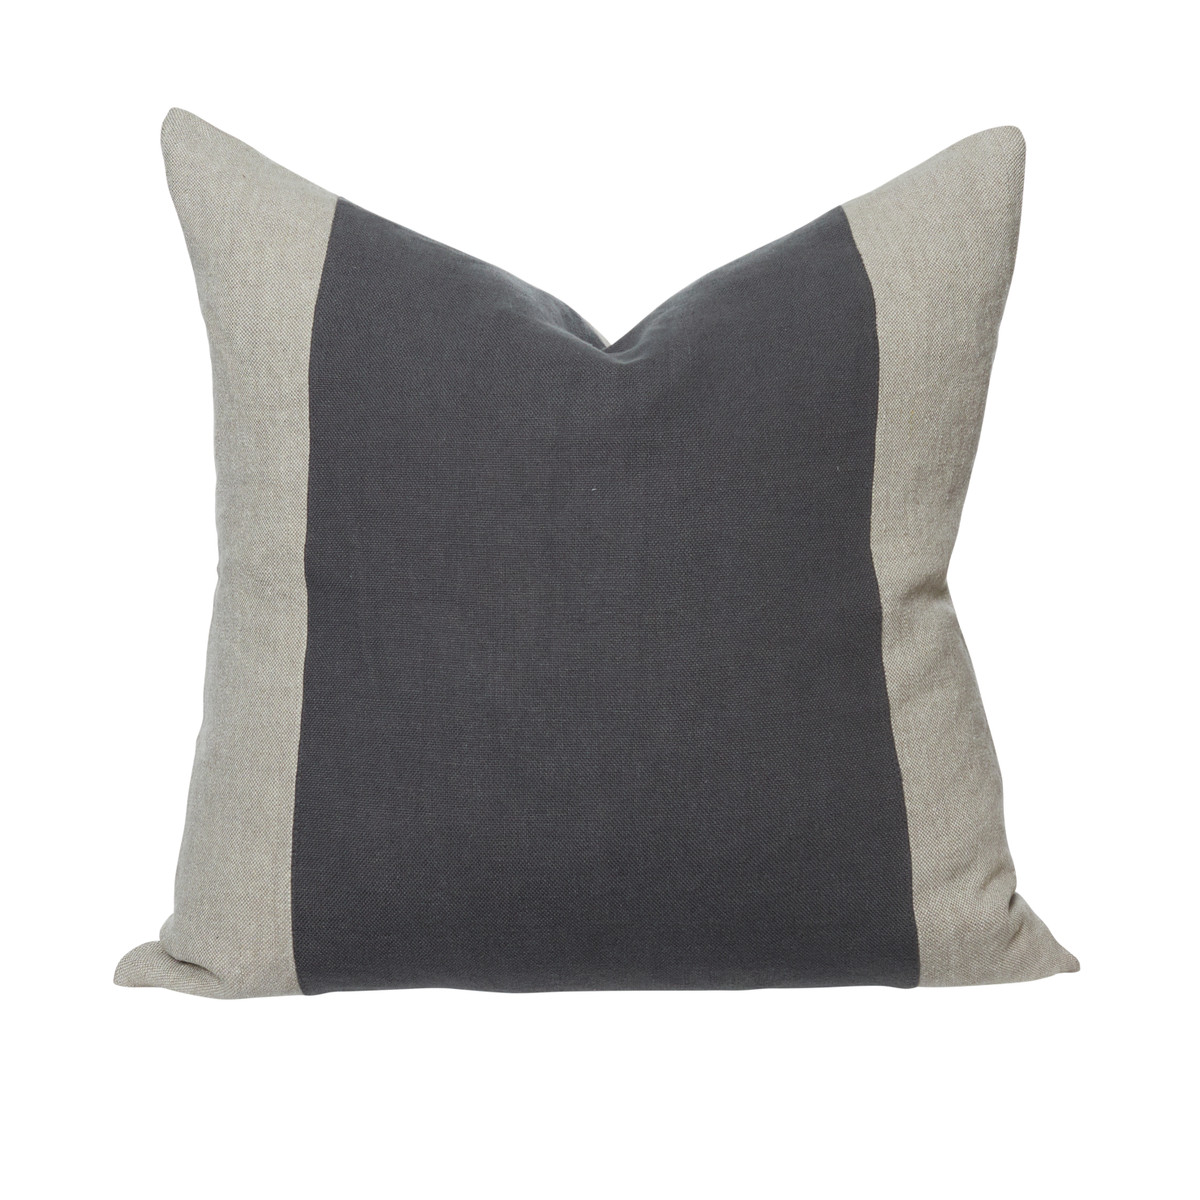 Christine 26 Gray Linen Euro Pillow - Front